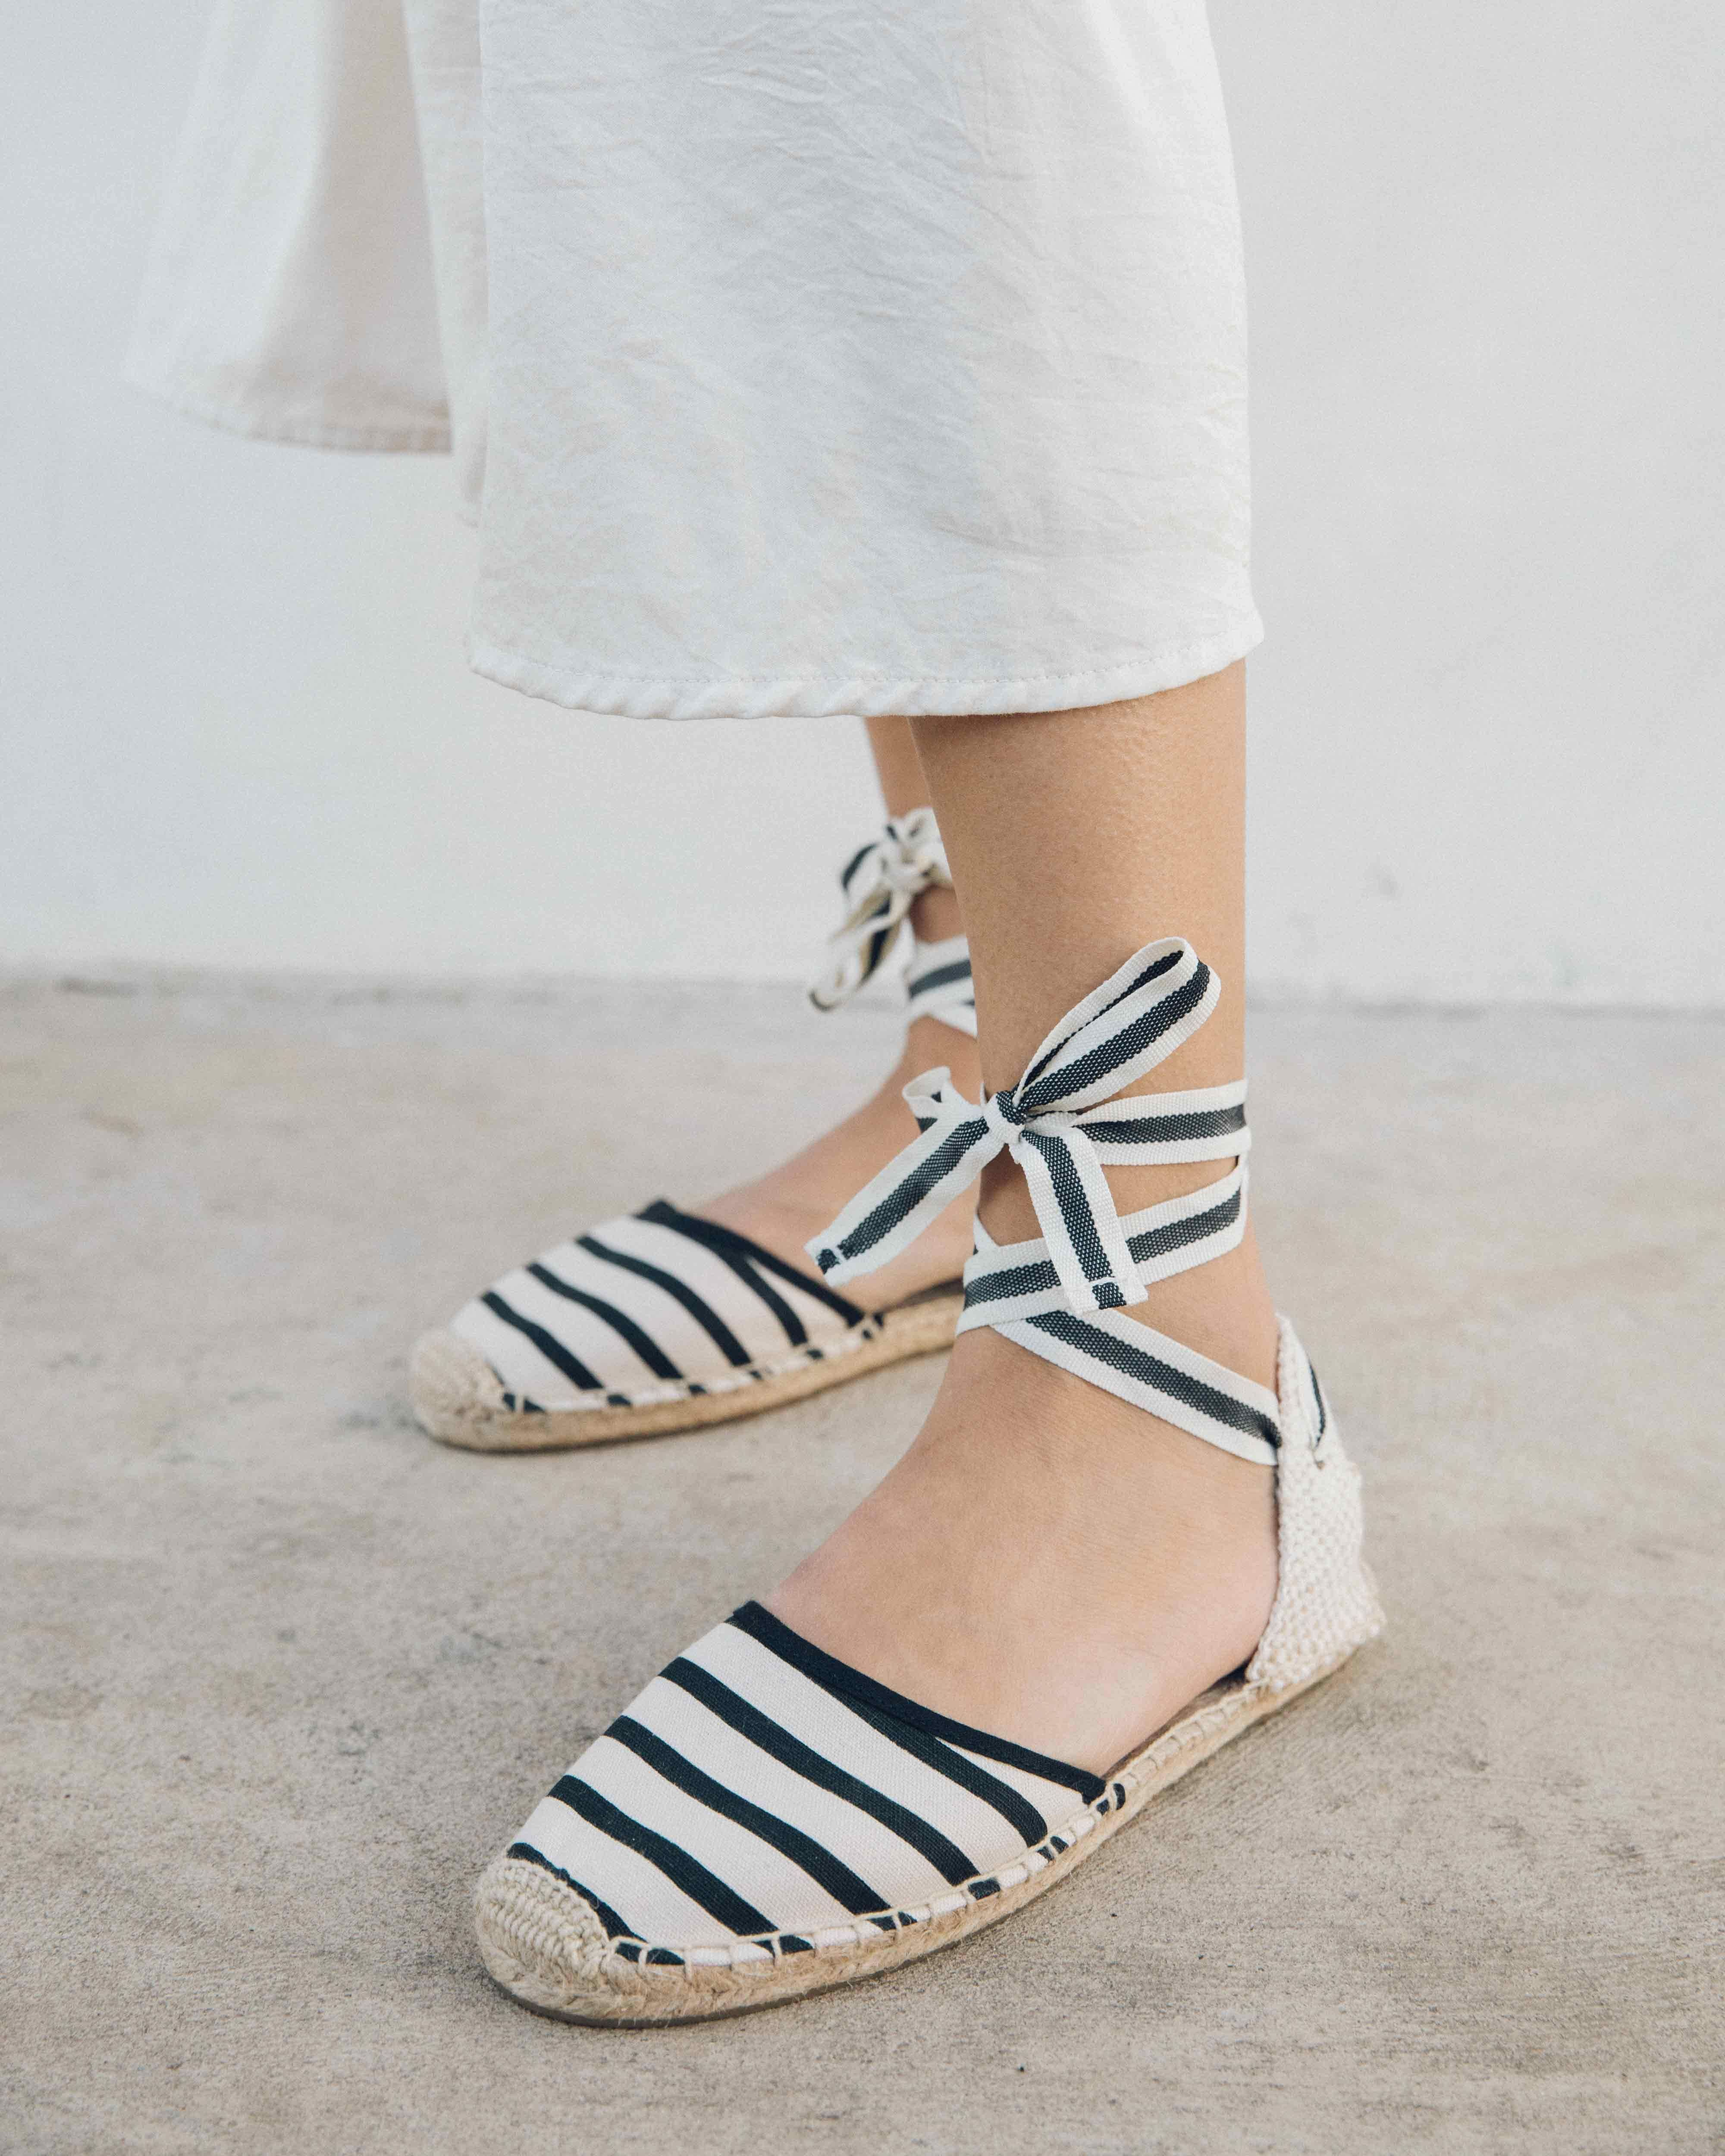 a6fde88ba7e Classic Striped Sandal - Natural Black / 5 | for the wish list ...